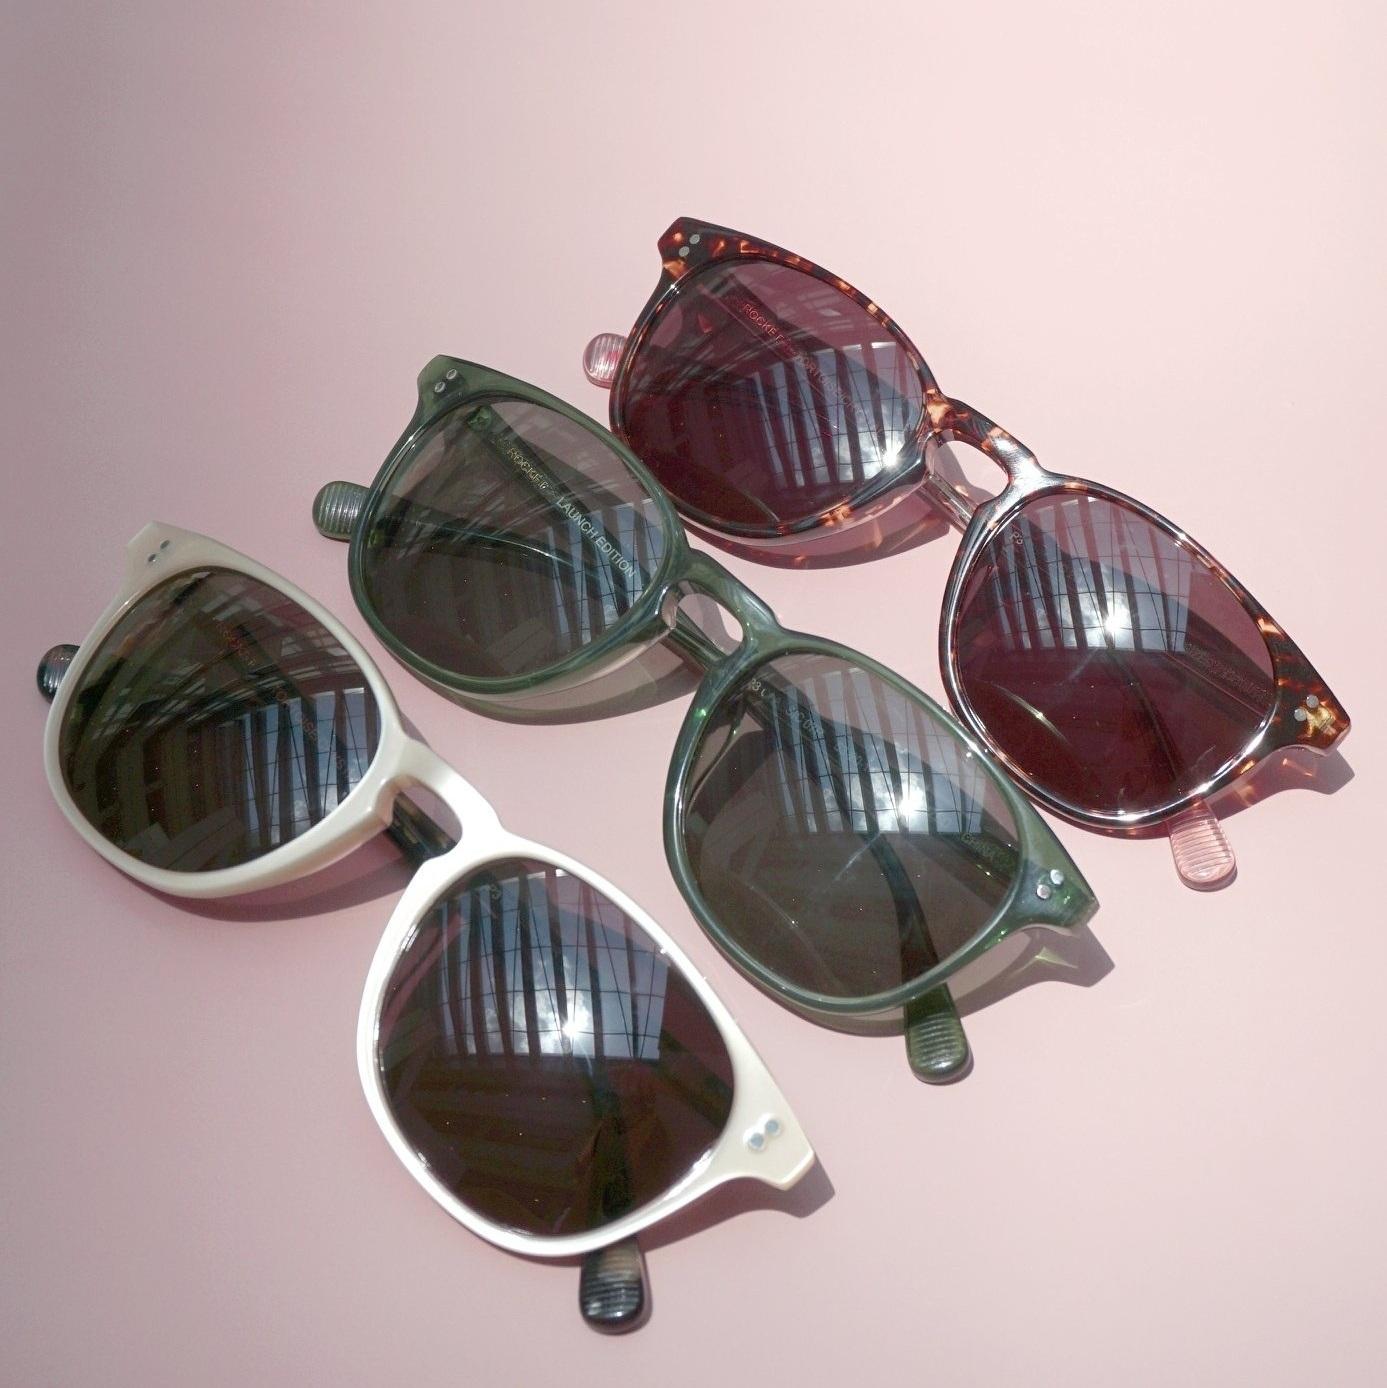 Rocket Eyewear - Classic, handmade sunglasses. Featuring polarised P3 lenses. Designed in Singapore.